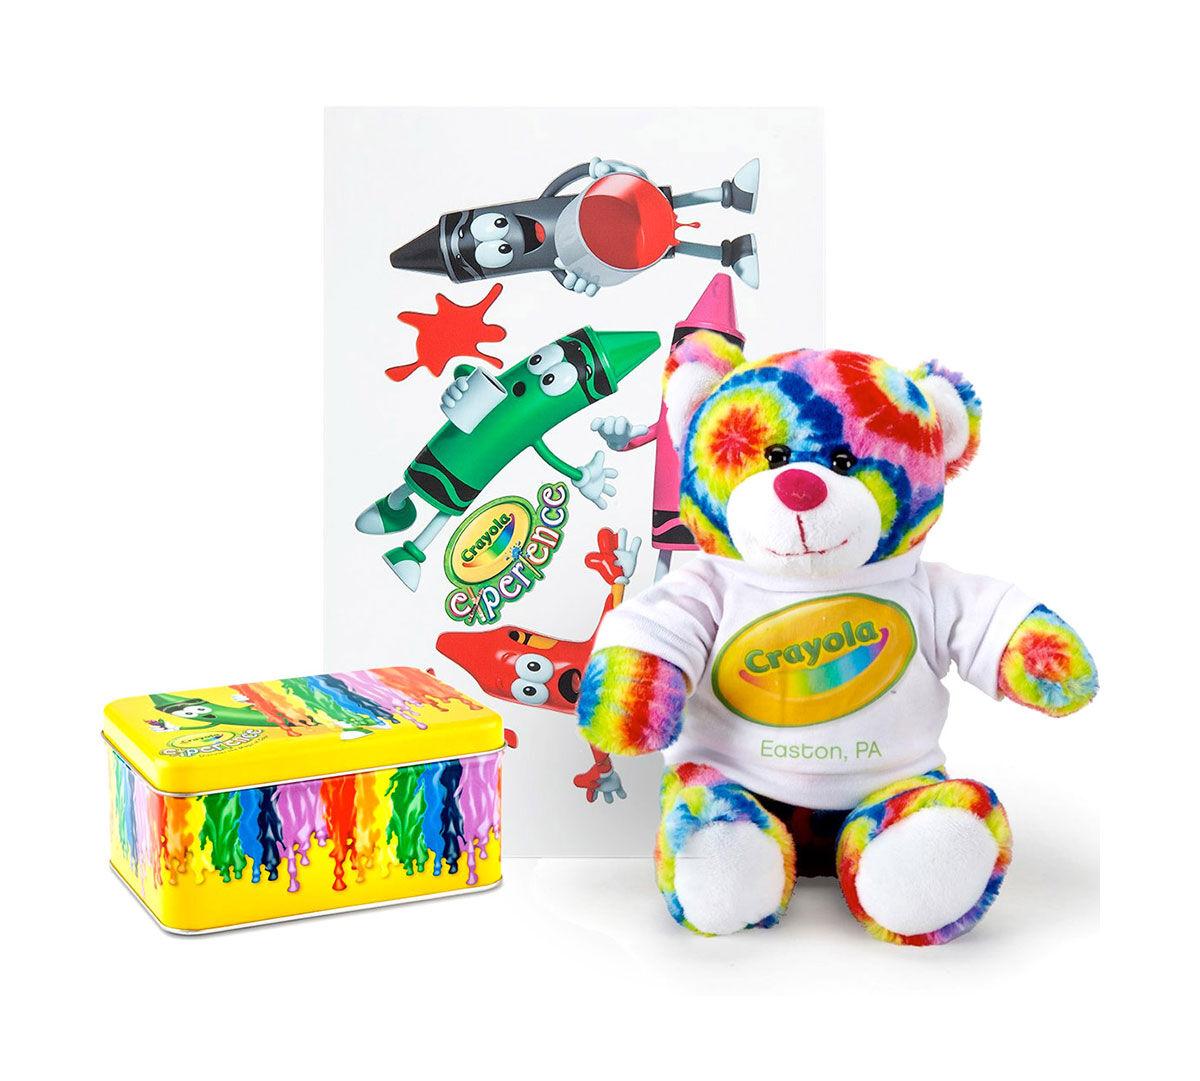 Crayola Fan Kit for Child